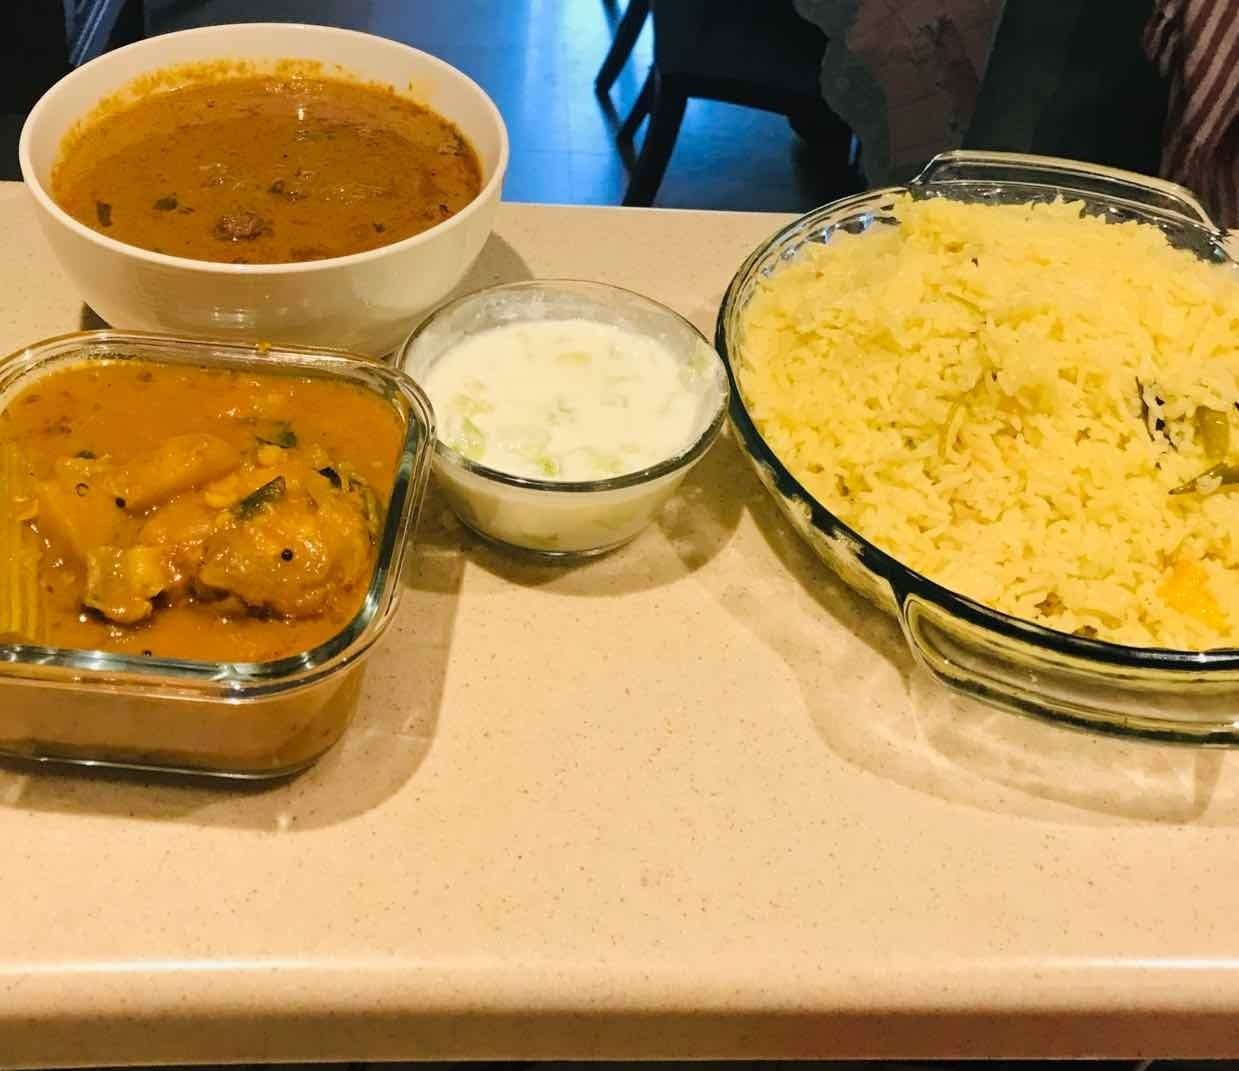 Photo of Coconut milk rice , Mutton curry, mutton bone dalcha by Wajithajasmine Raja mohamed sait at BetterButter